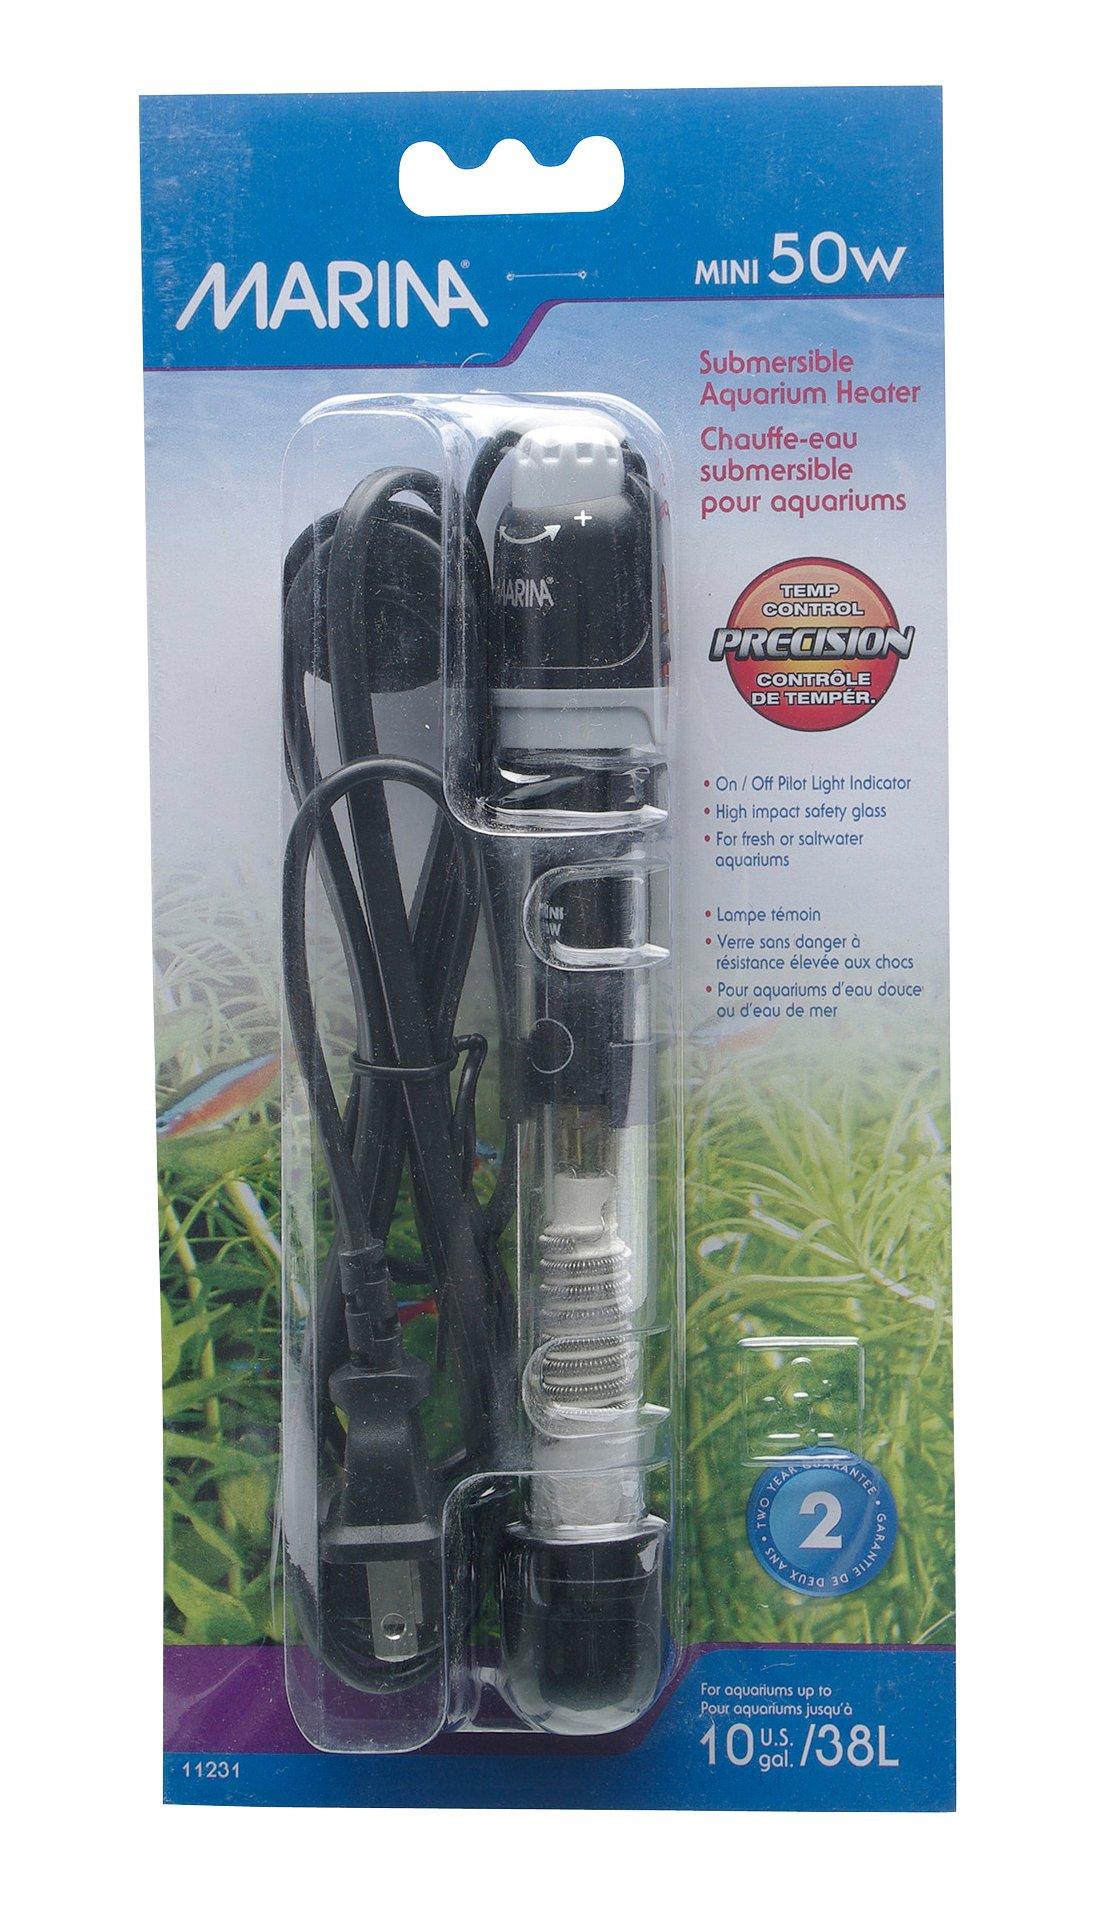 Fluval Marina Submersible Heater for Aquarium, Mini, 50-watt